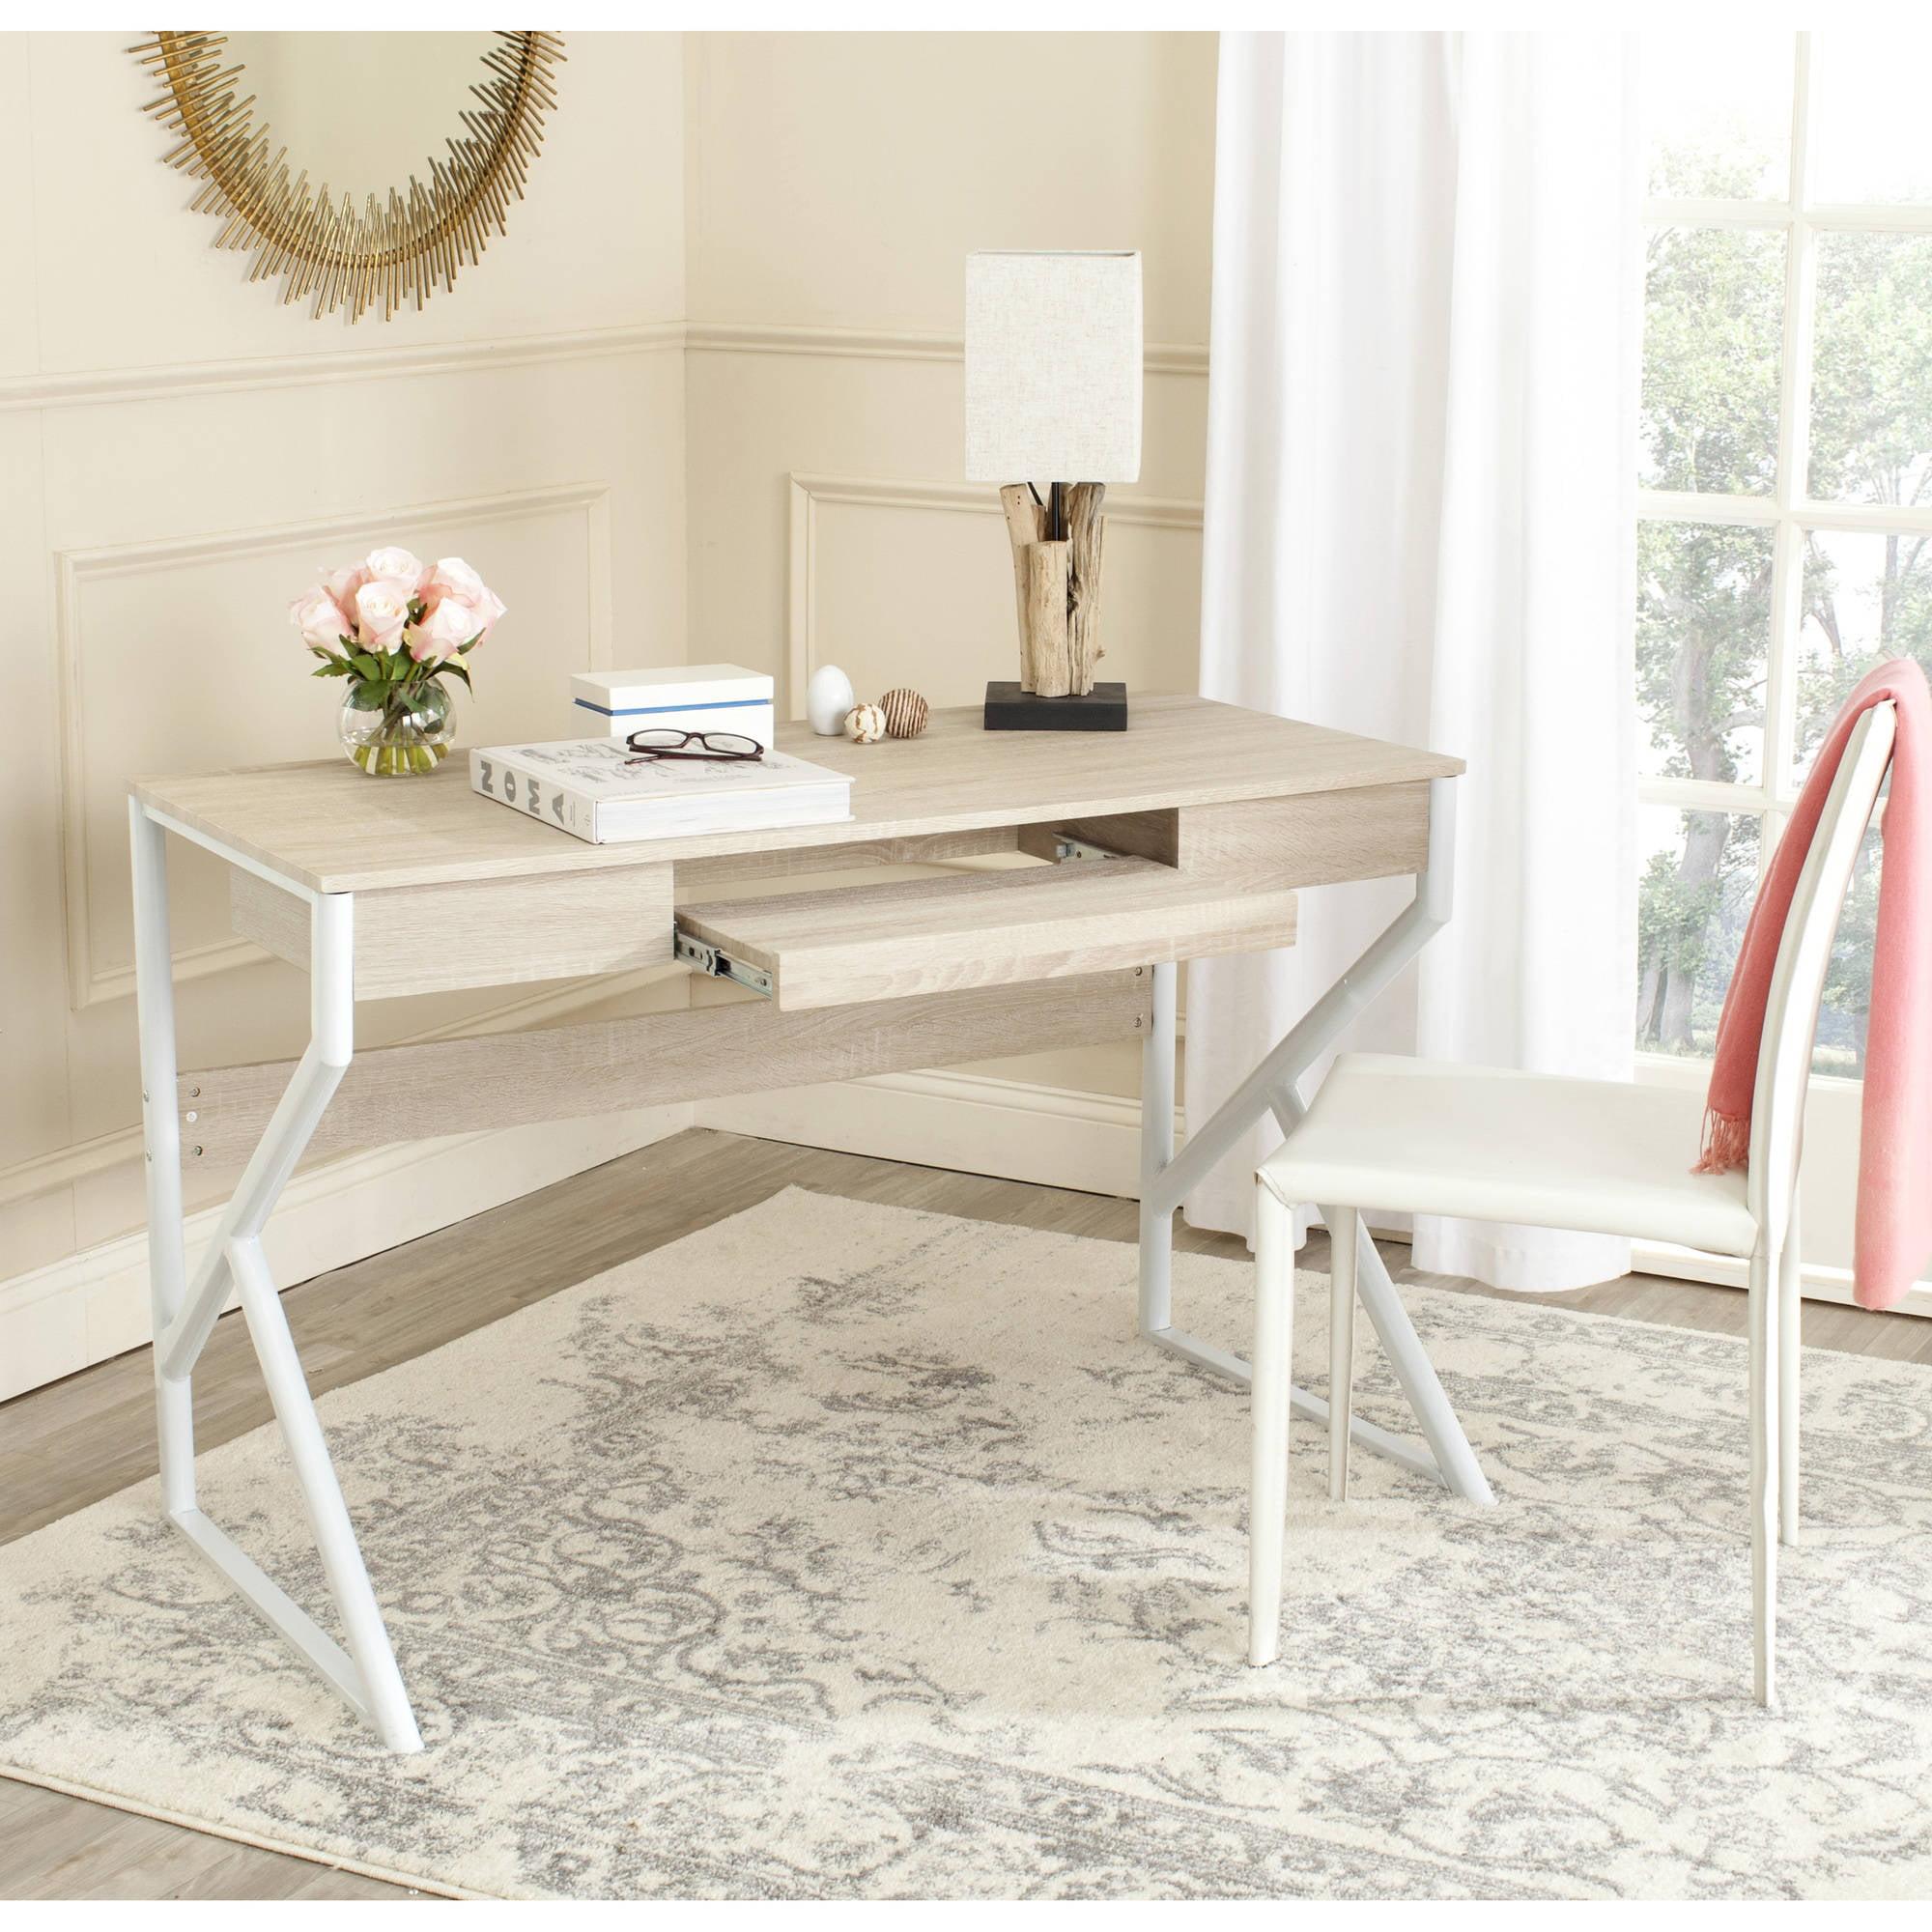 Safavieh Bryany Computer Desk, Natural Top White Legs by Safavieh